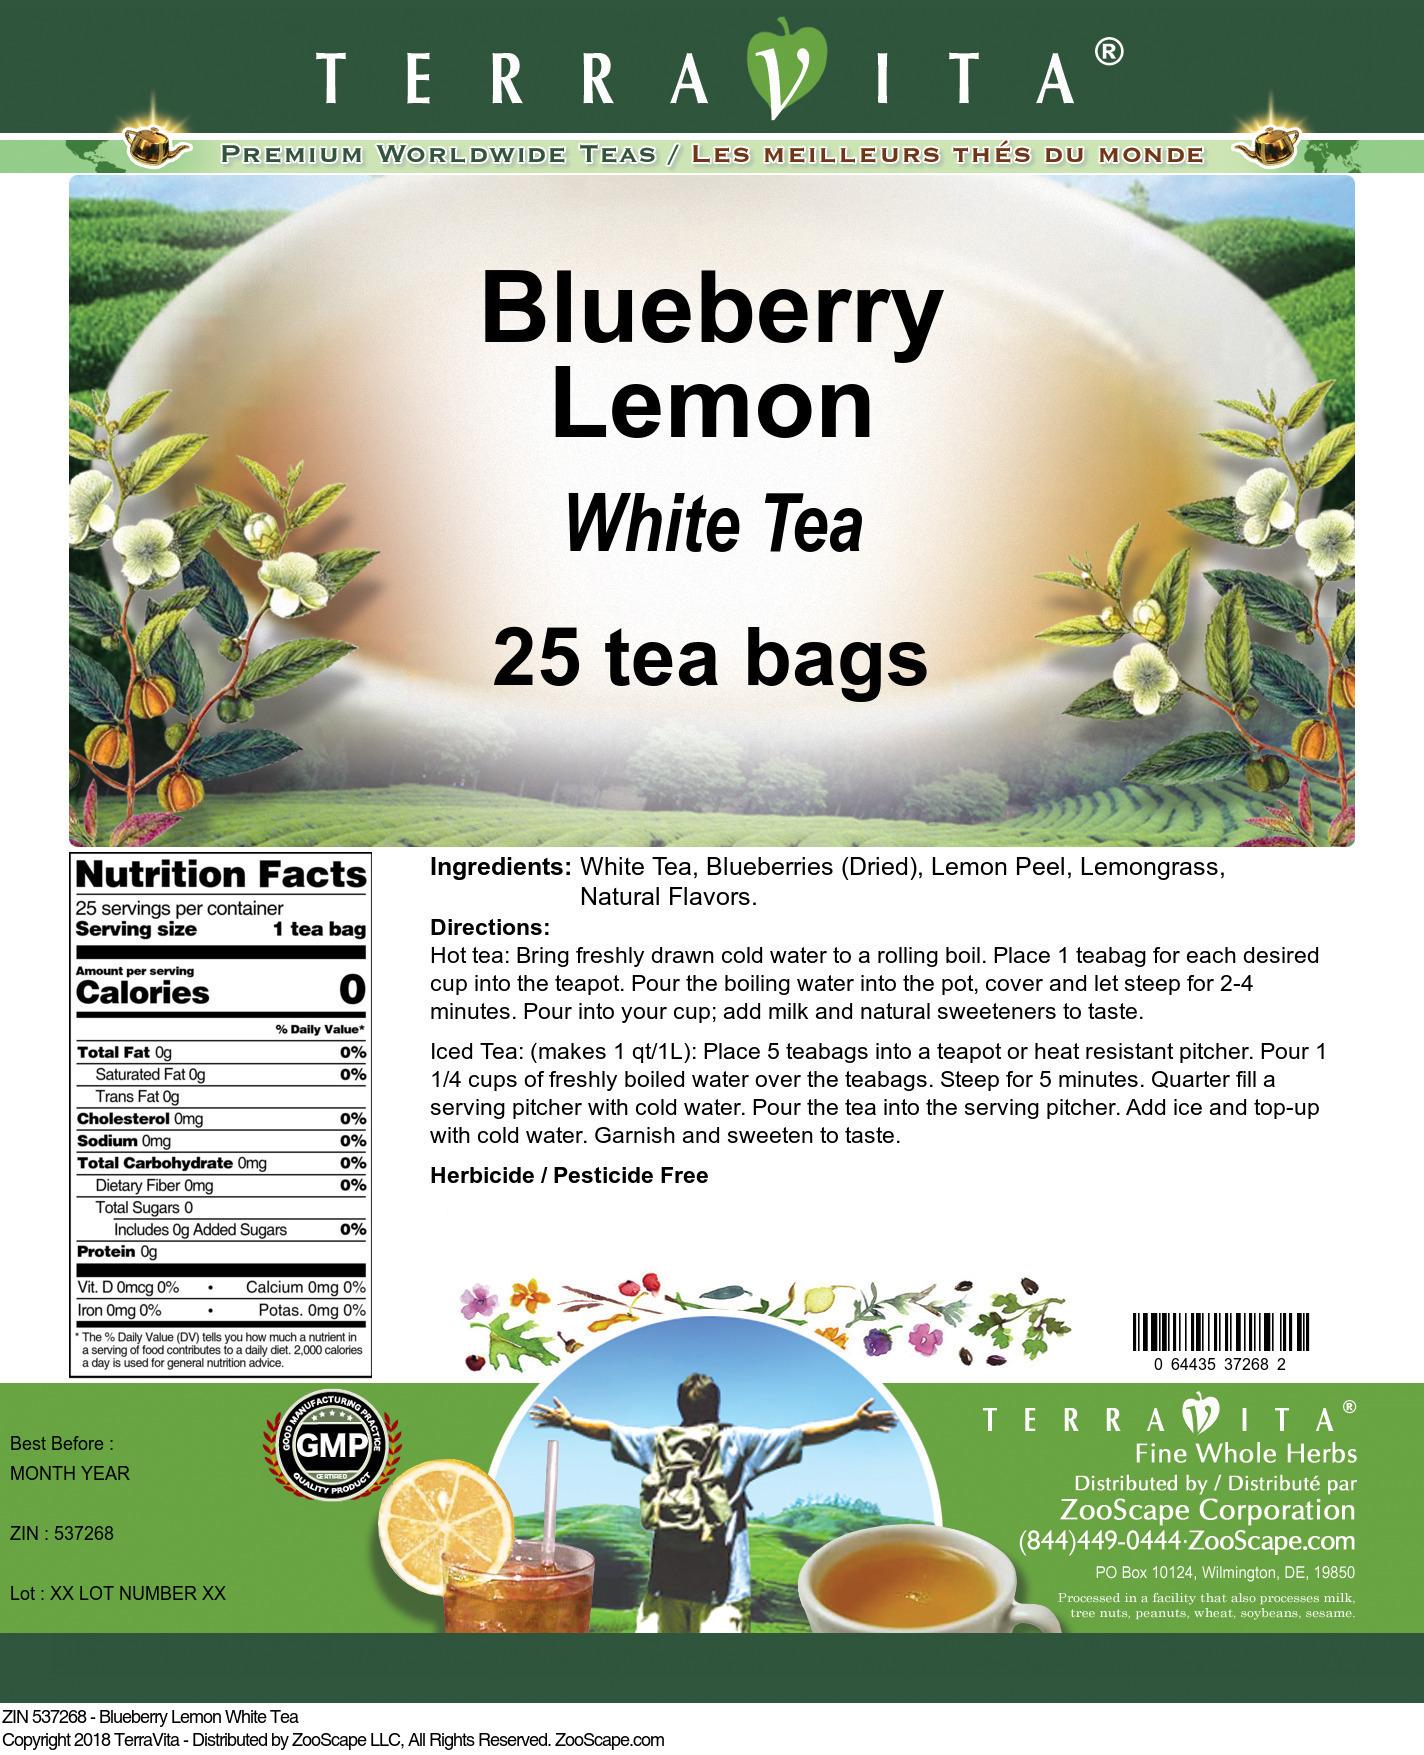 Blueberry Lemon White Tea